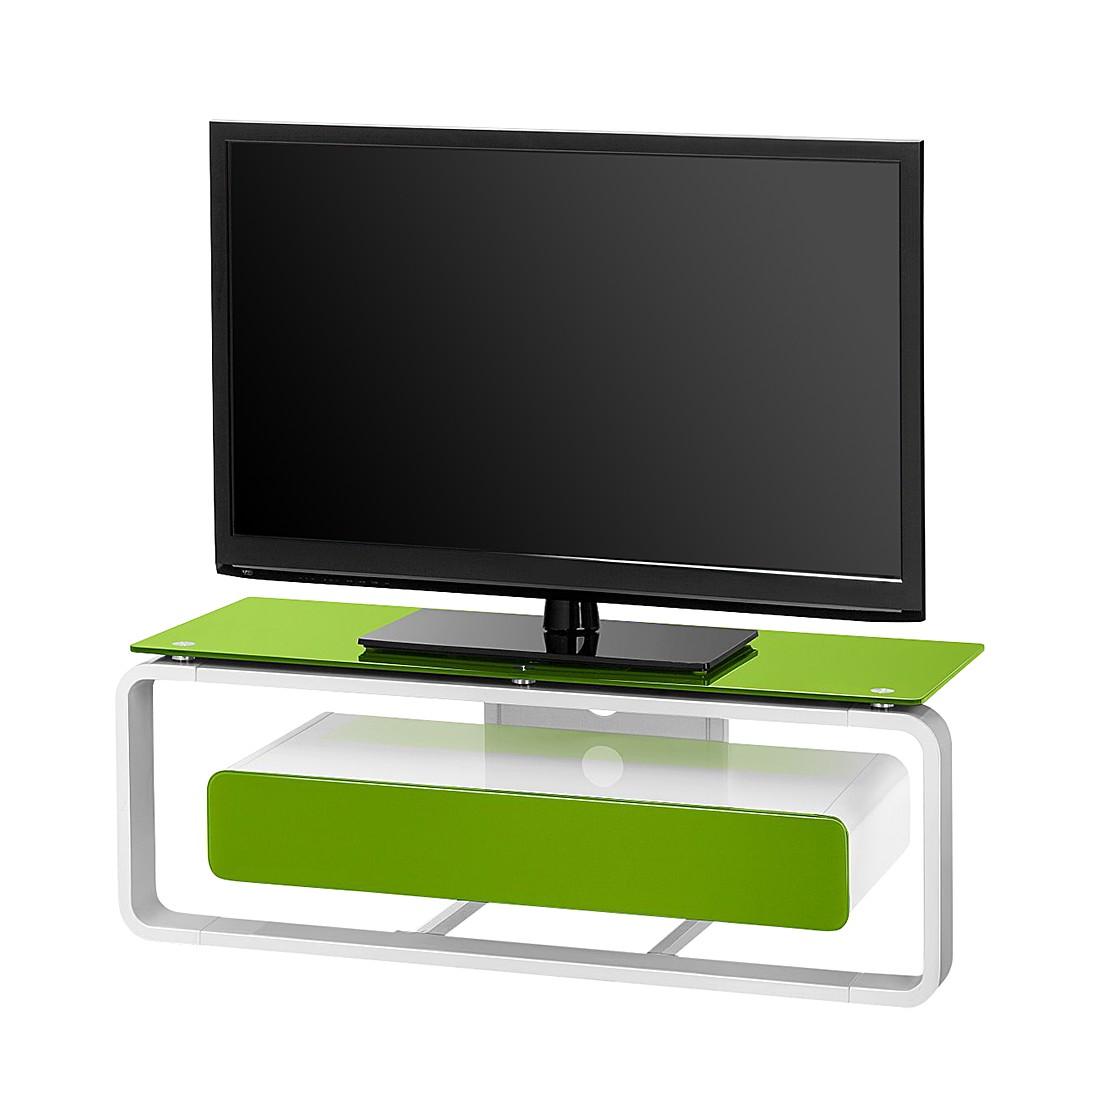 tv rack shanon wei glas gr n 110 cm loftscape online bestellen. Black Bedroom Furniture Sets. Home Design Ideas